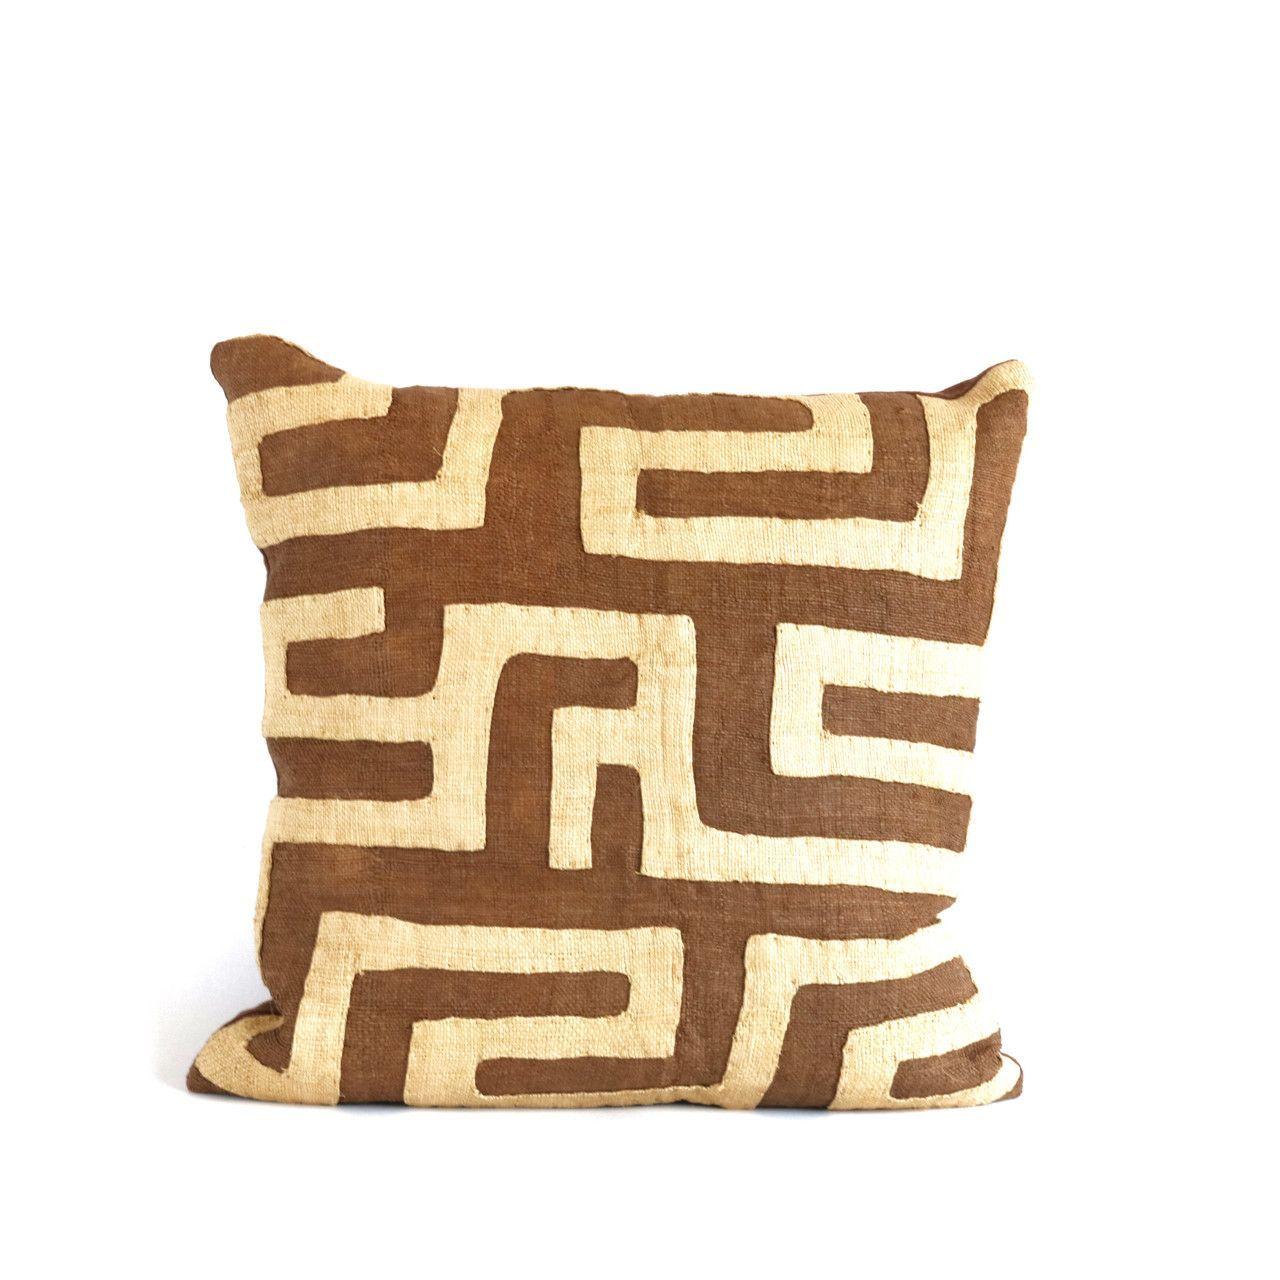 Appliqué Kuba Cloth Pillows - The Loaded Trunk